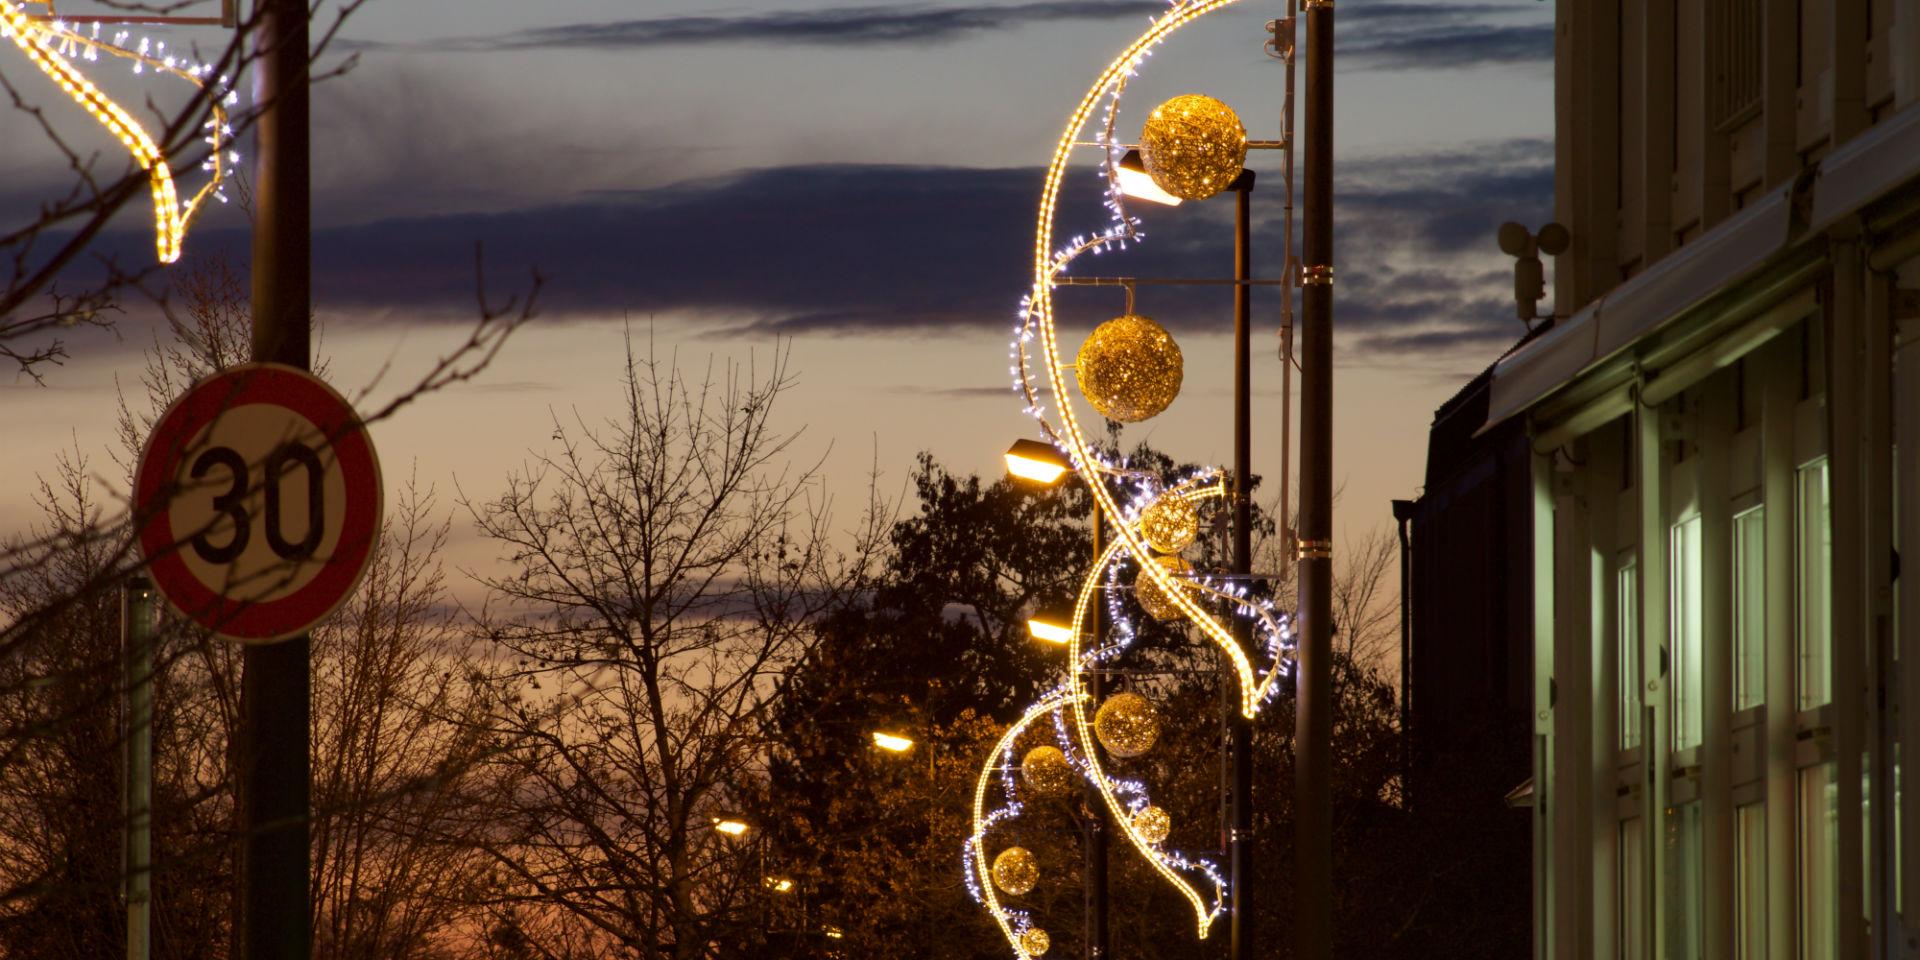 Weihnachtsbeleuchtung München.Festive Decorative Lighting For Streets Mk Illumination Mk